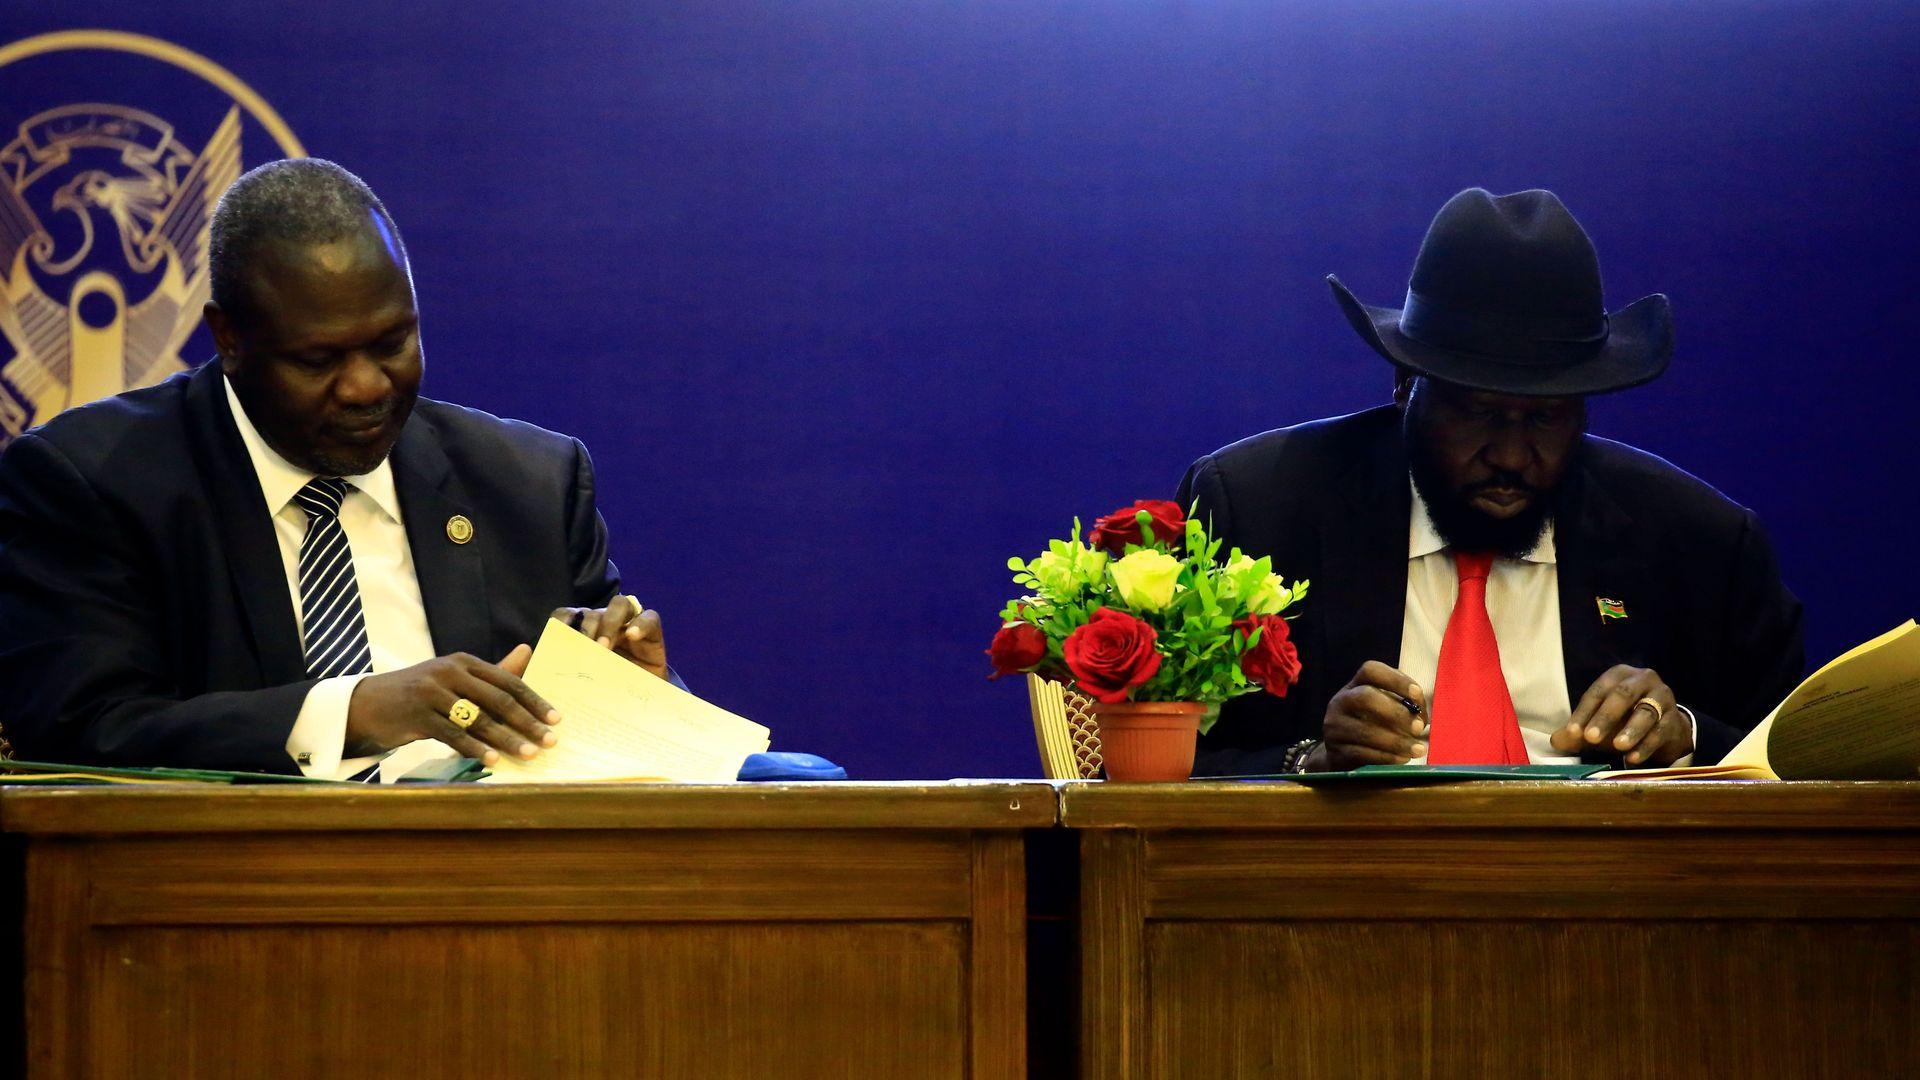 President of South Sudan, Salva Kiir (R) and South Sudan rebel leader Riek Machar attend a final power-sharing deal between South Sudanese arch-foes.